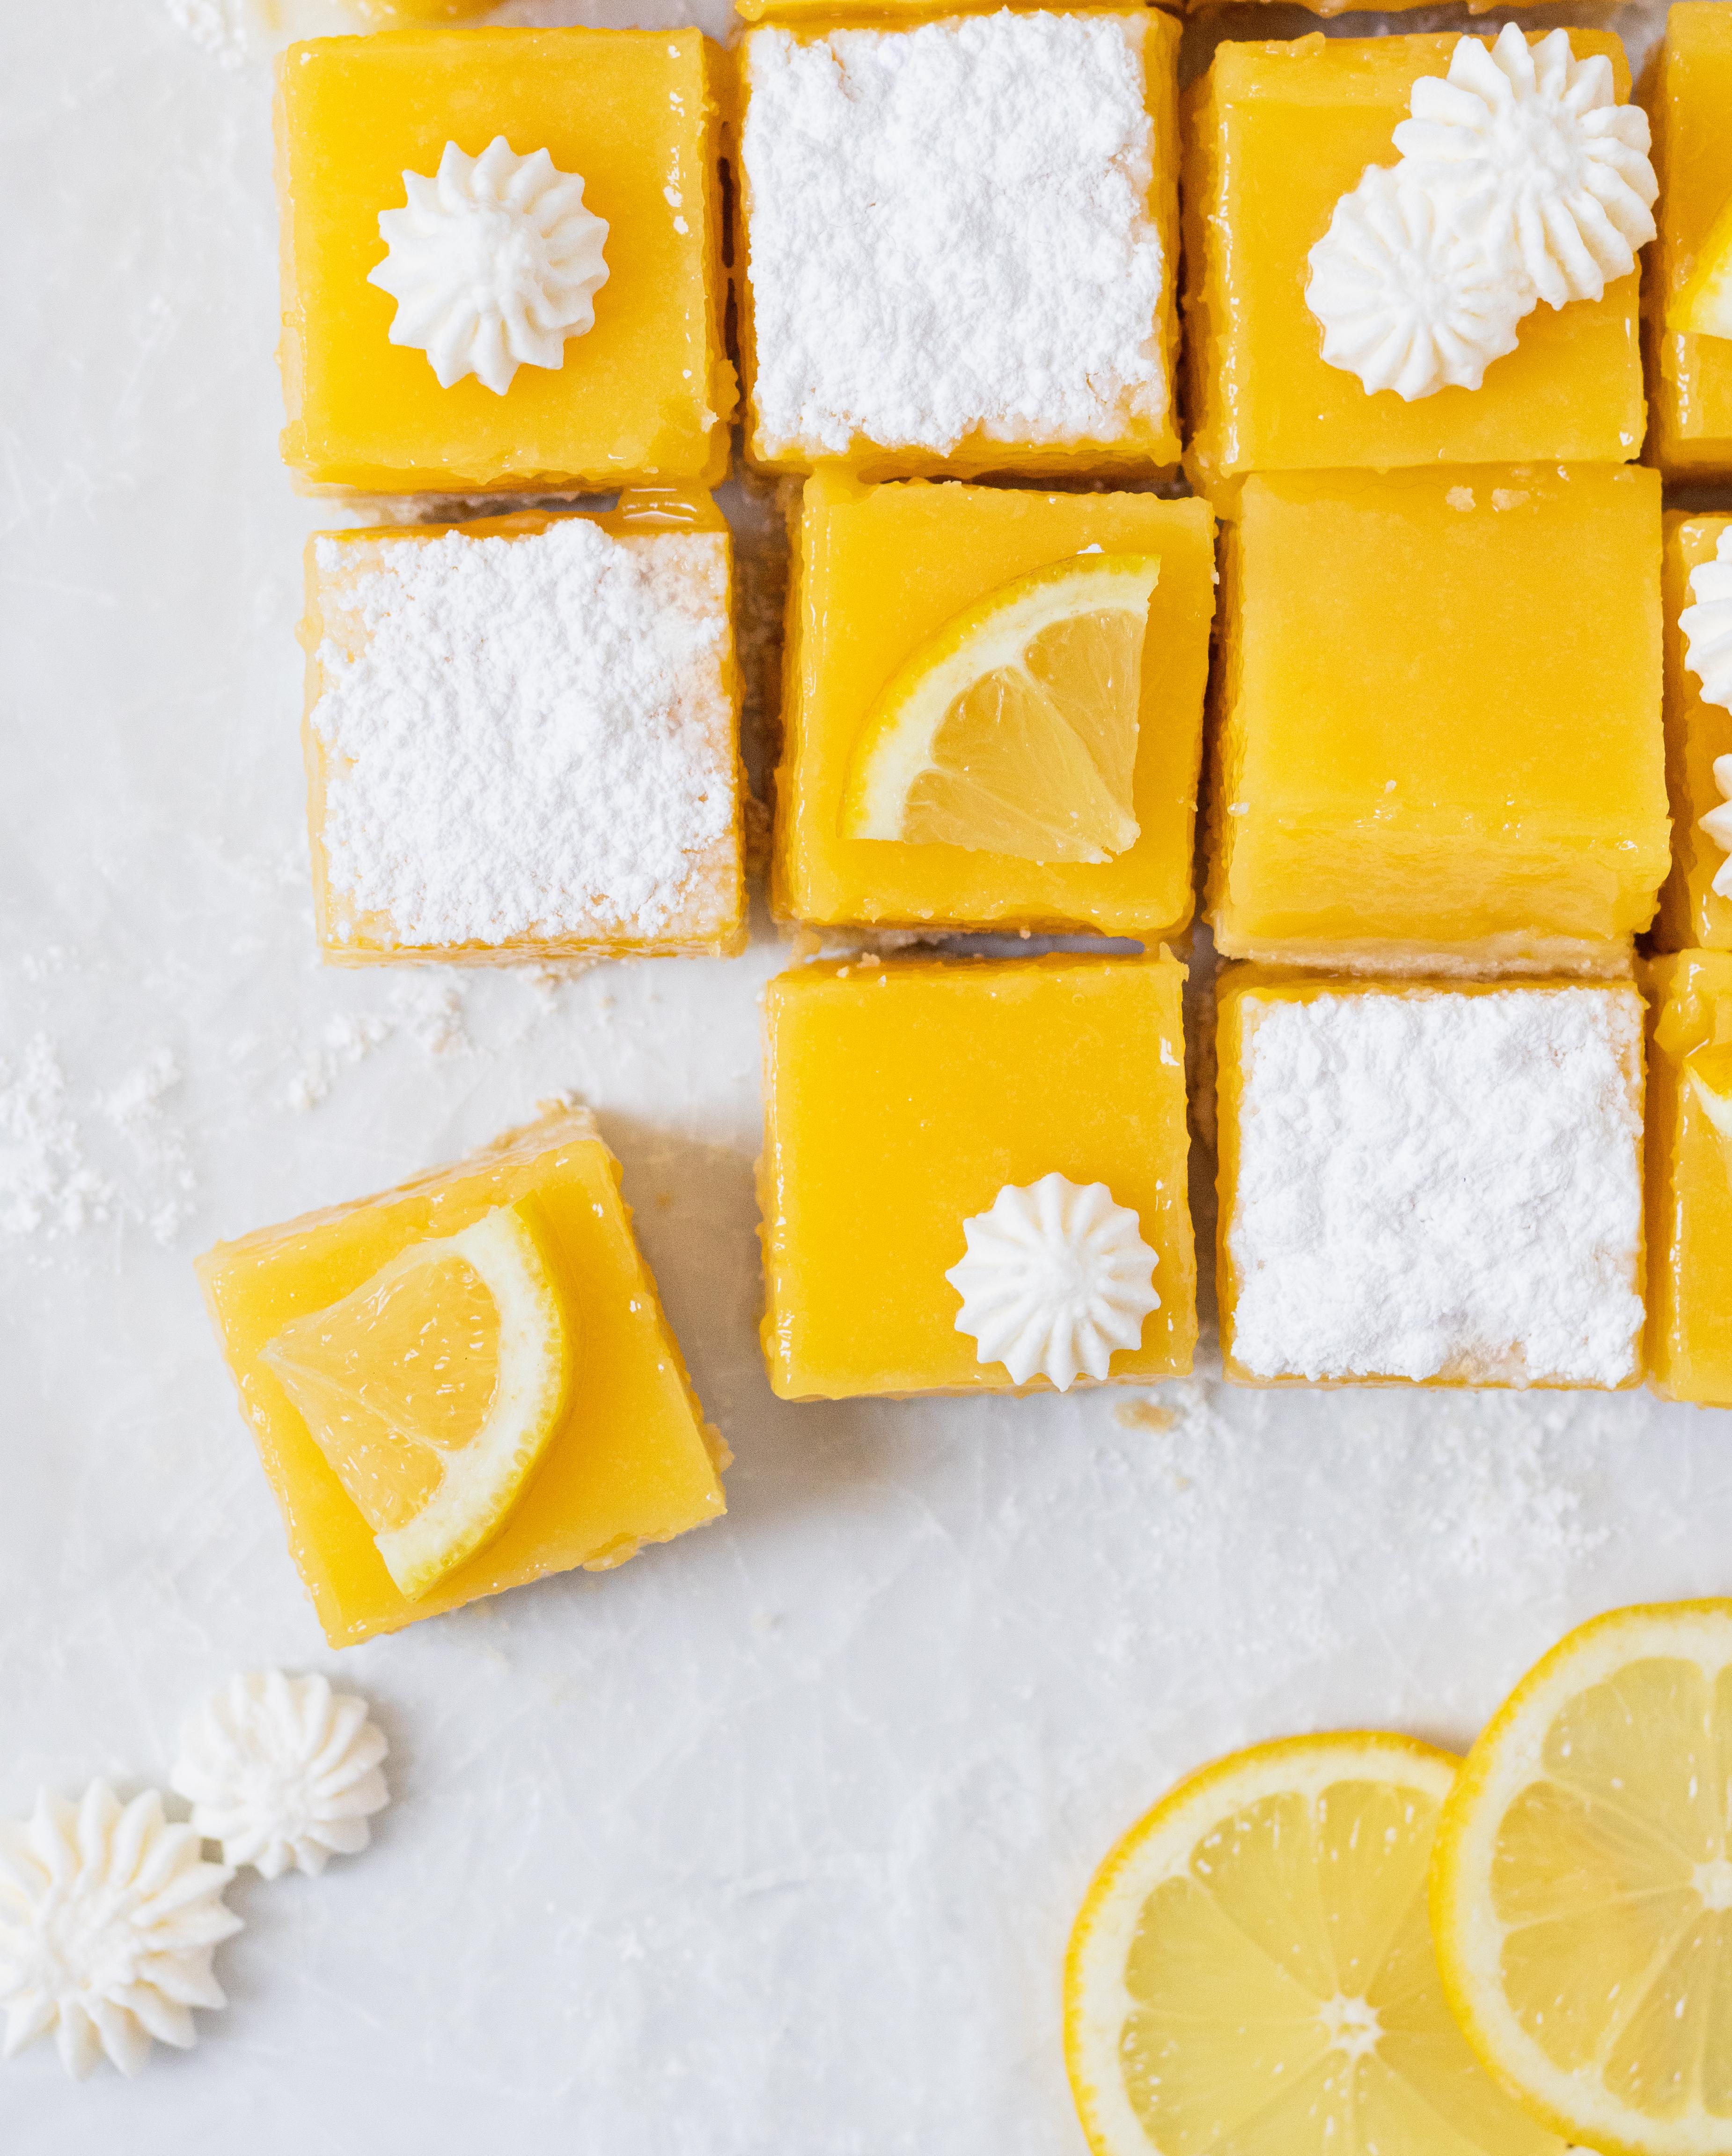 Flatlay of Lemon Bars